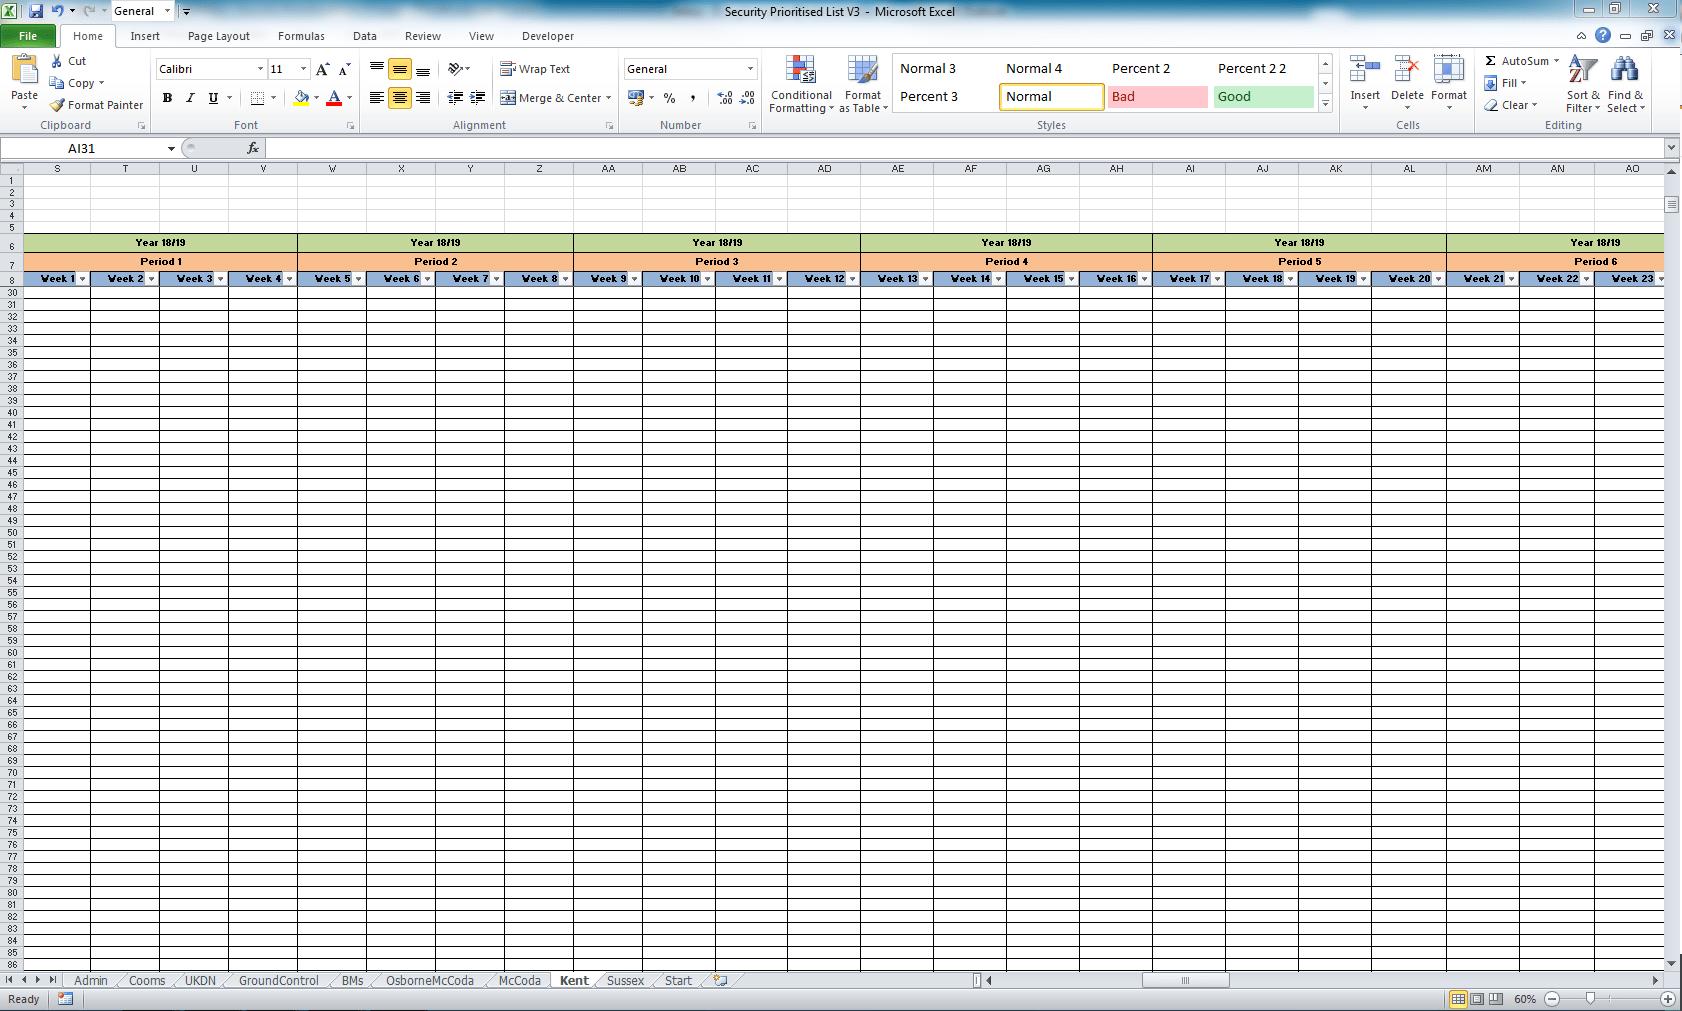 Excel Vba Userform Checkboxes Hide Unhide Columns